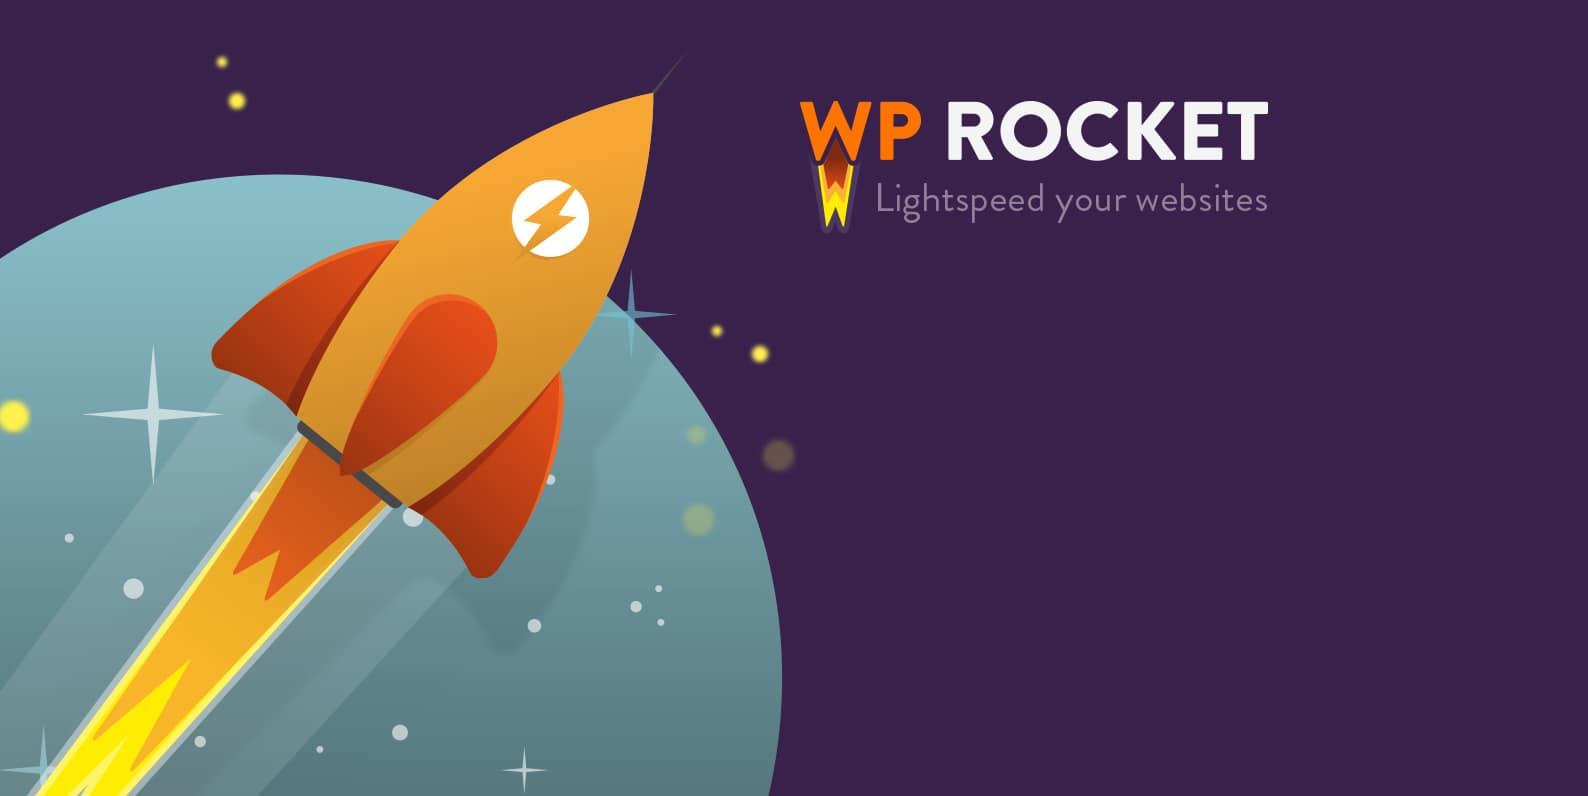 wp-rocket-plugin-seo-wordpress-tot-nhat-2021